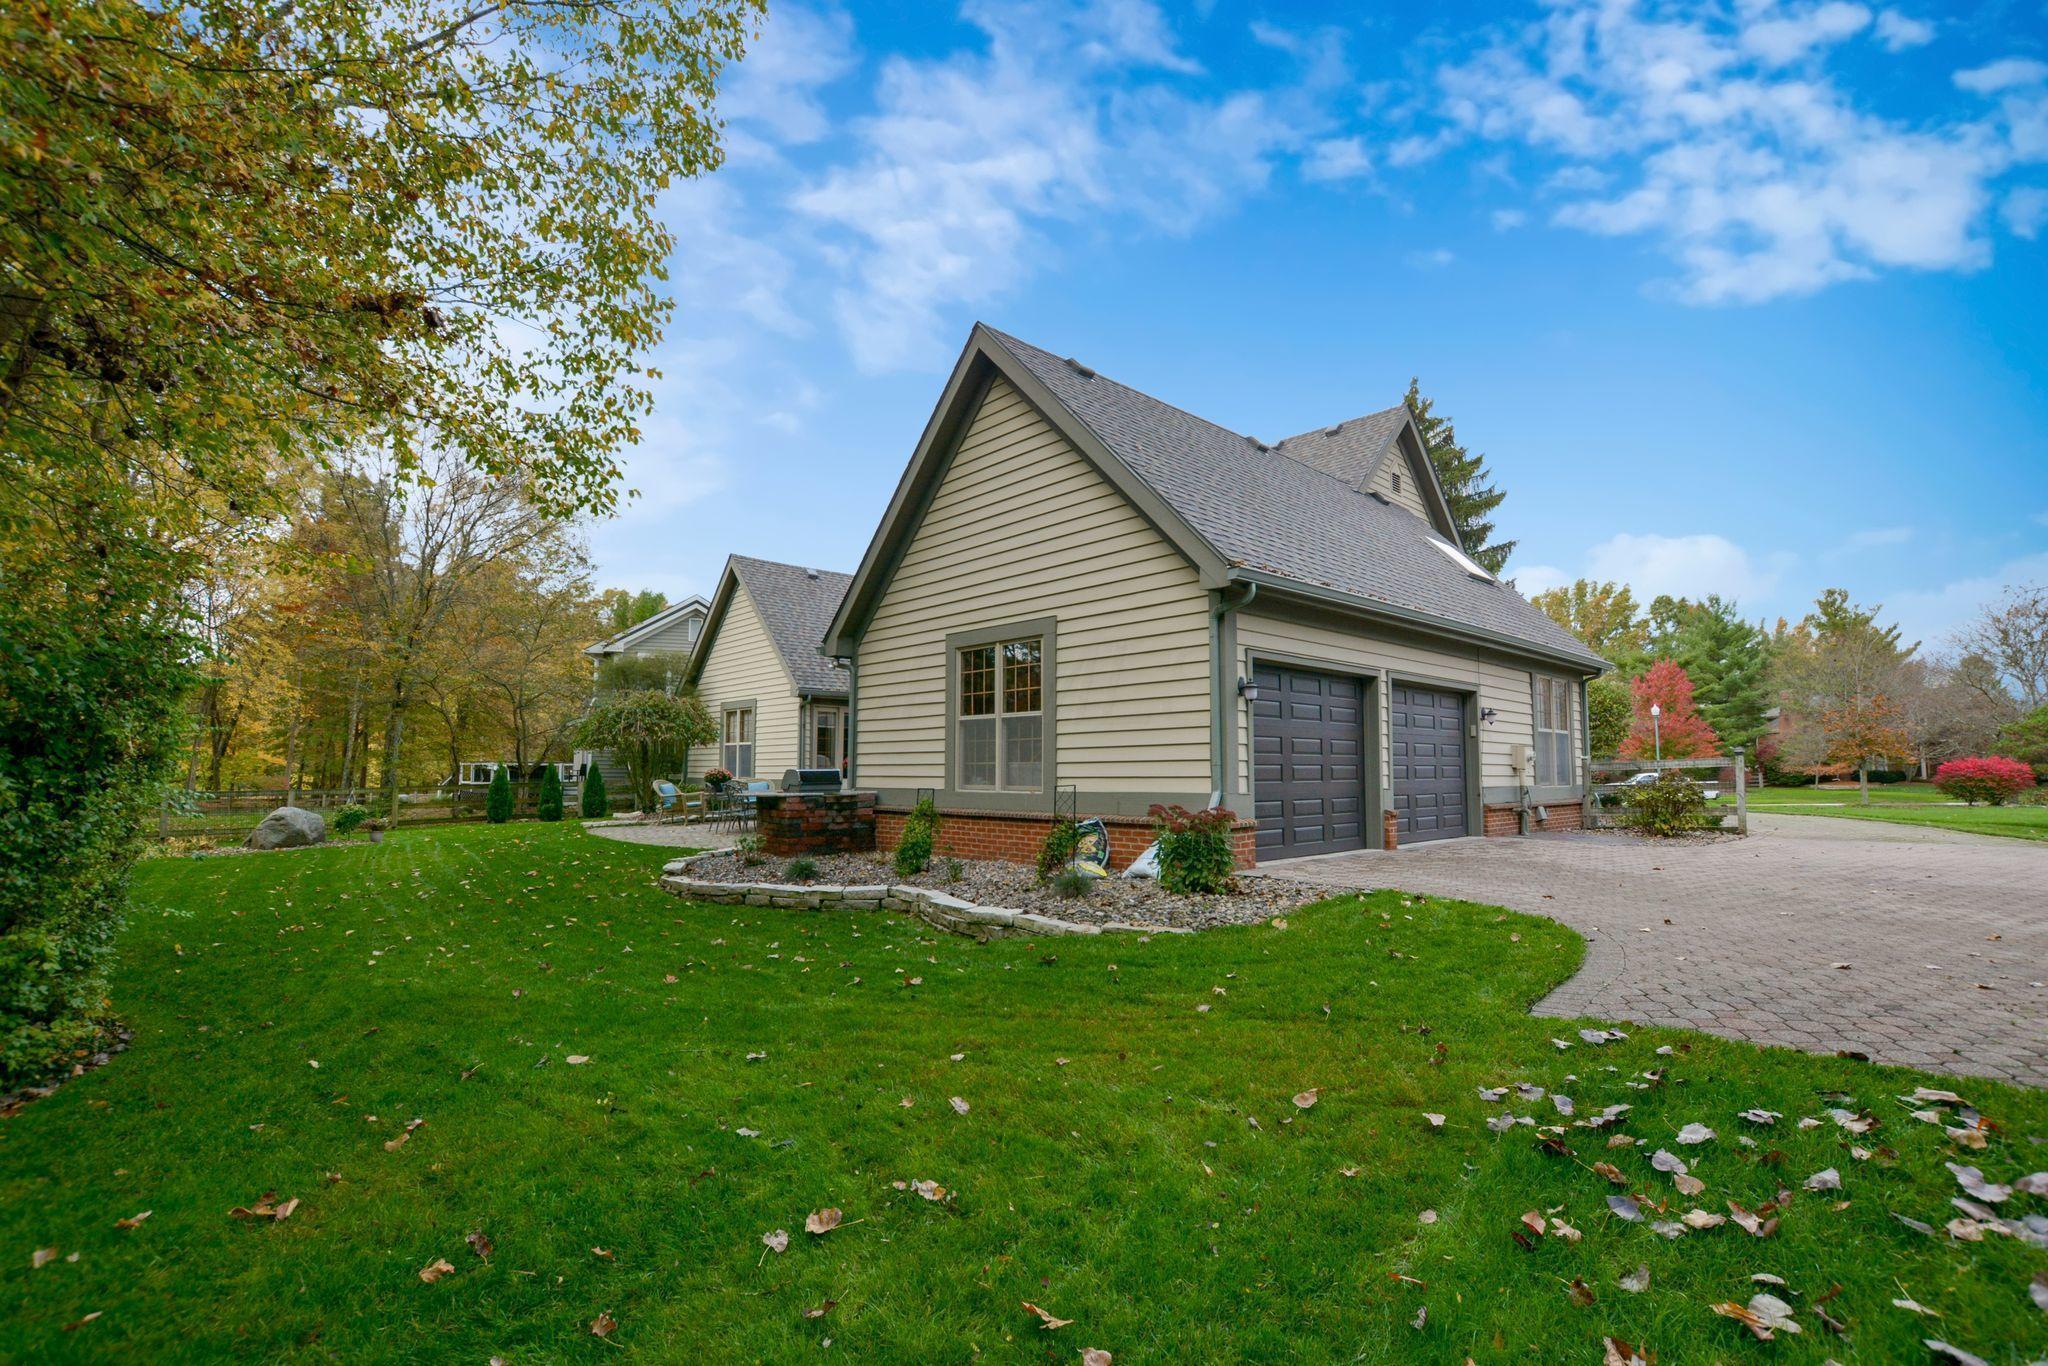 1137 Sleeping Meadow Drive, New Albany, Ohio 43054, 3 Bedrooms Bedrooms, ,4 BathroomsBathrooms,Residential,For Sale,Sleeping Meadow,220041052